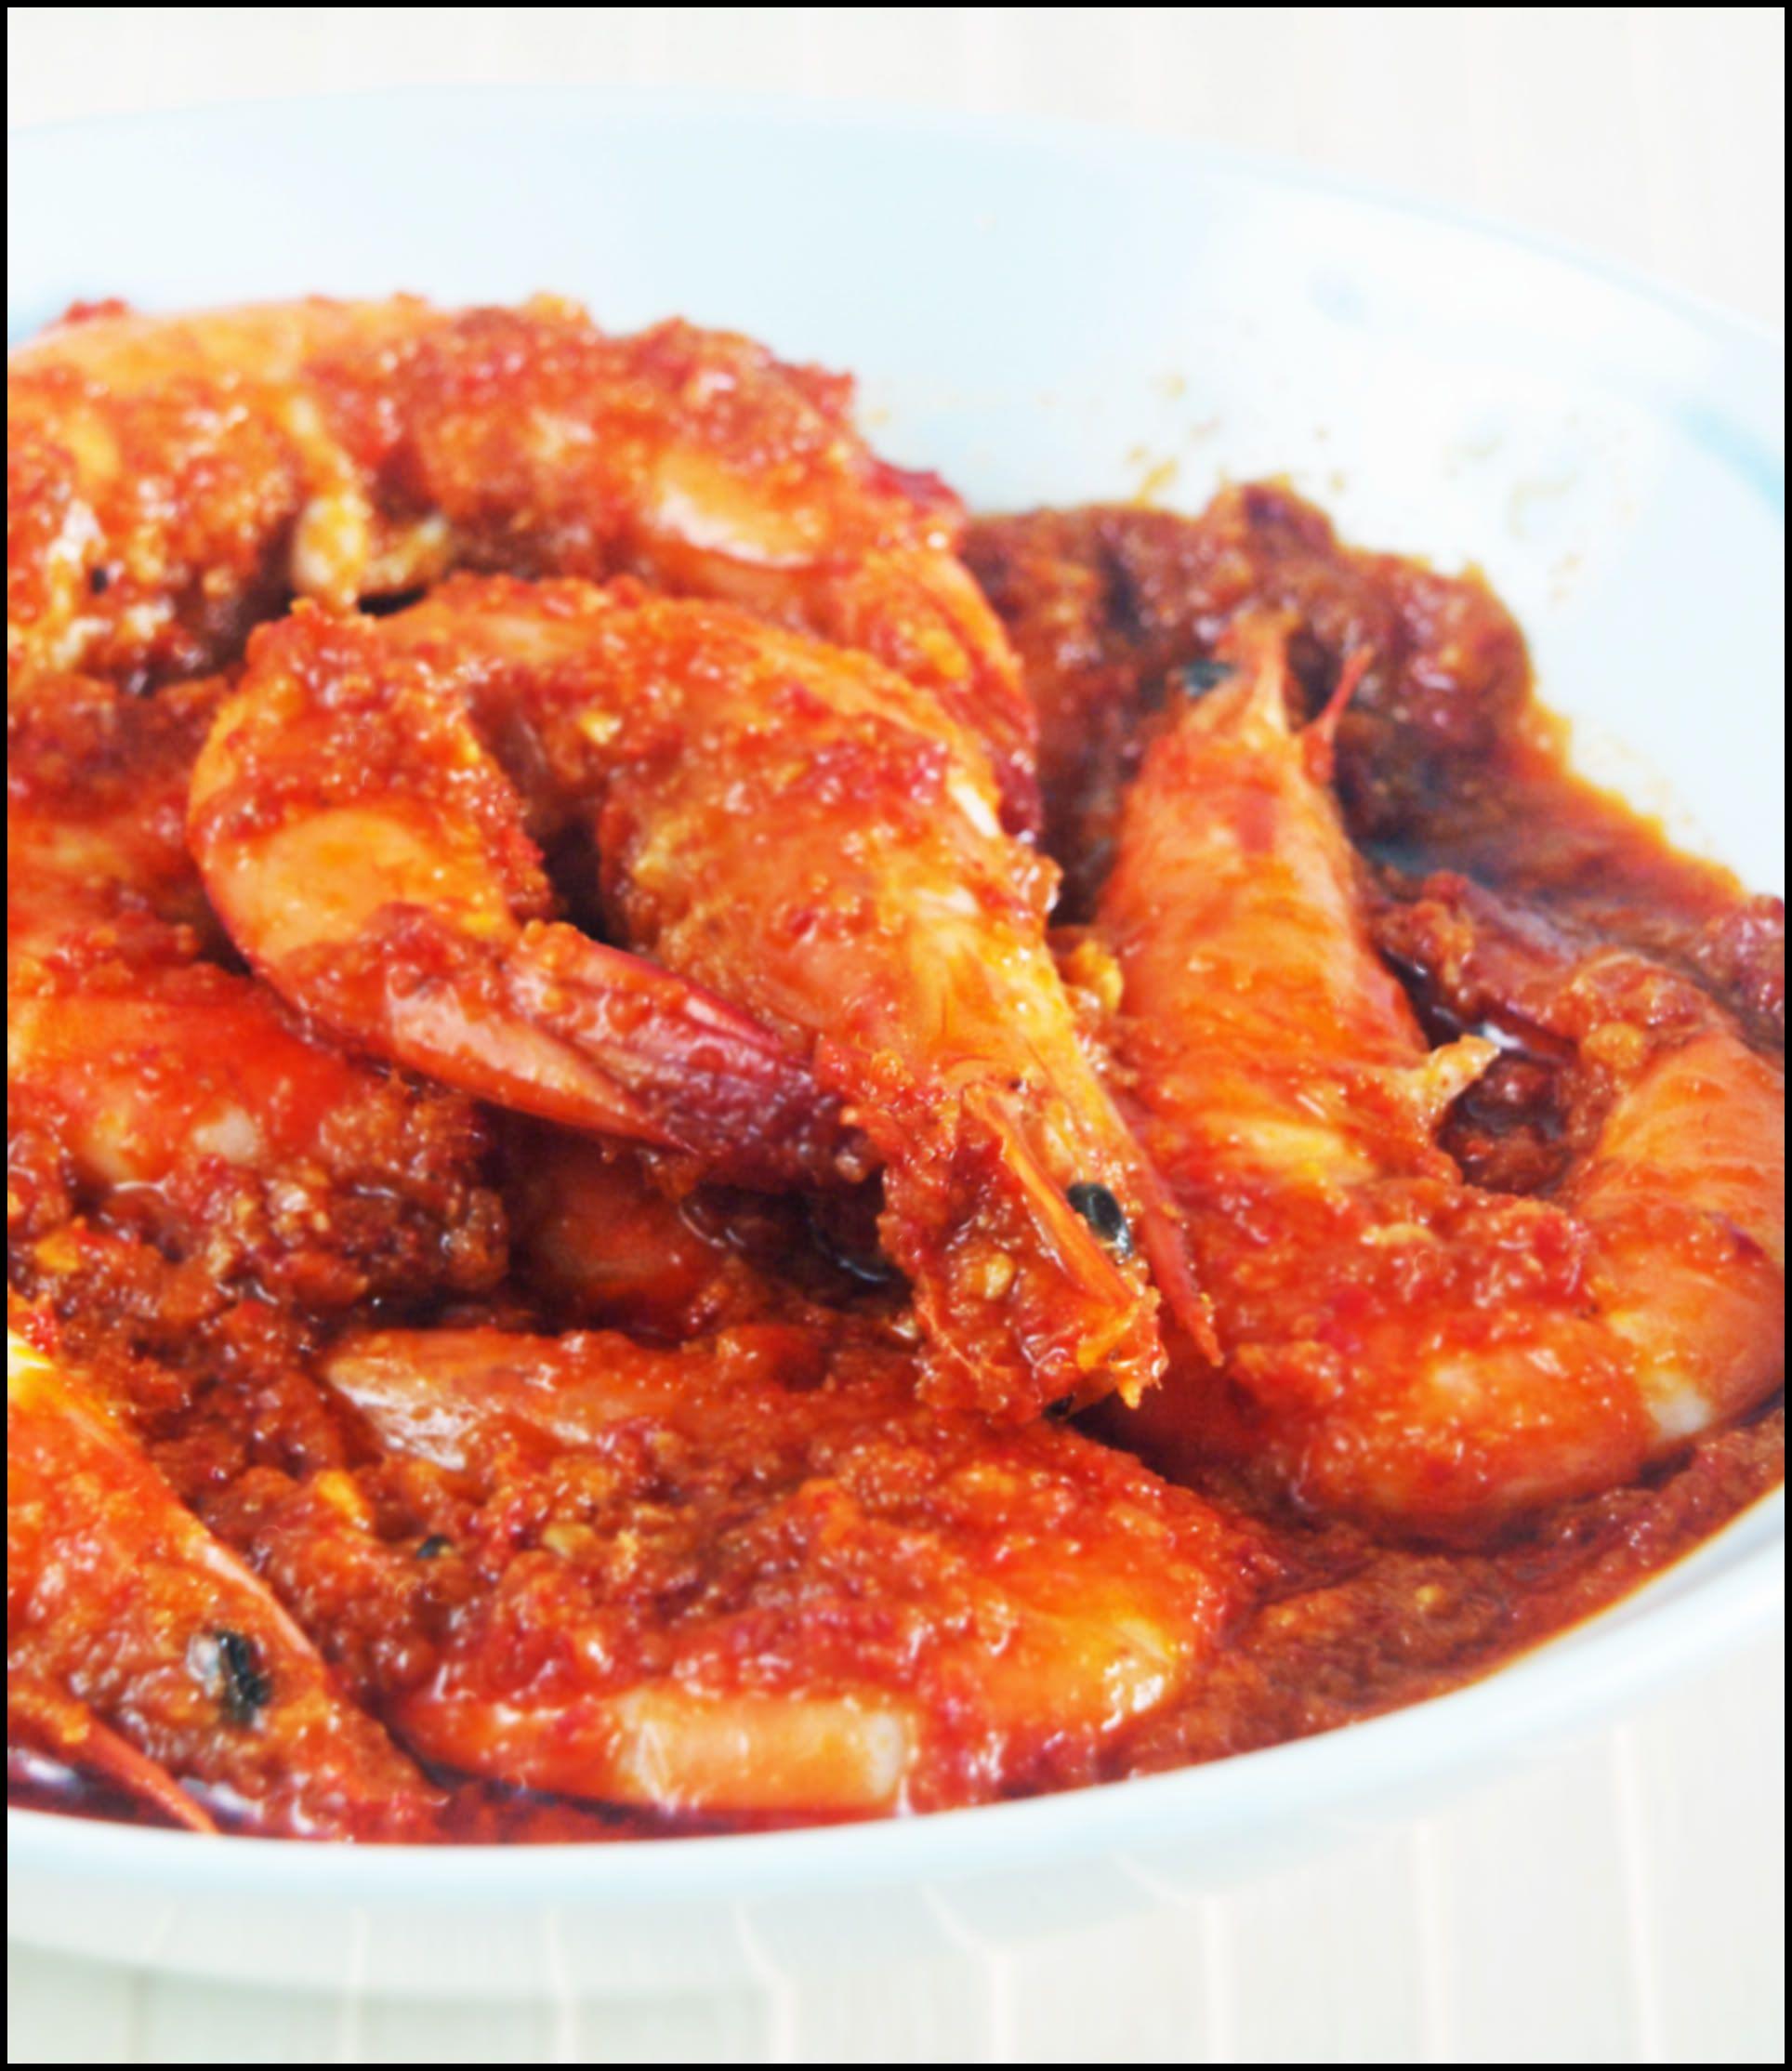 KitchenTigress: nyonya sambal udang